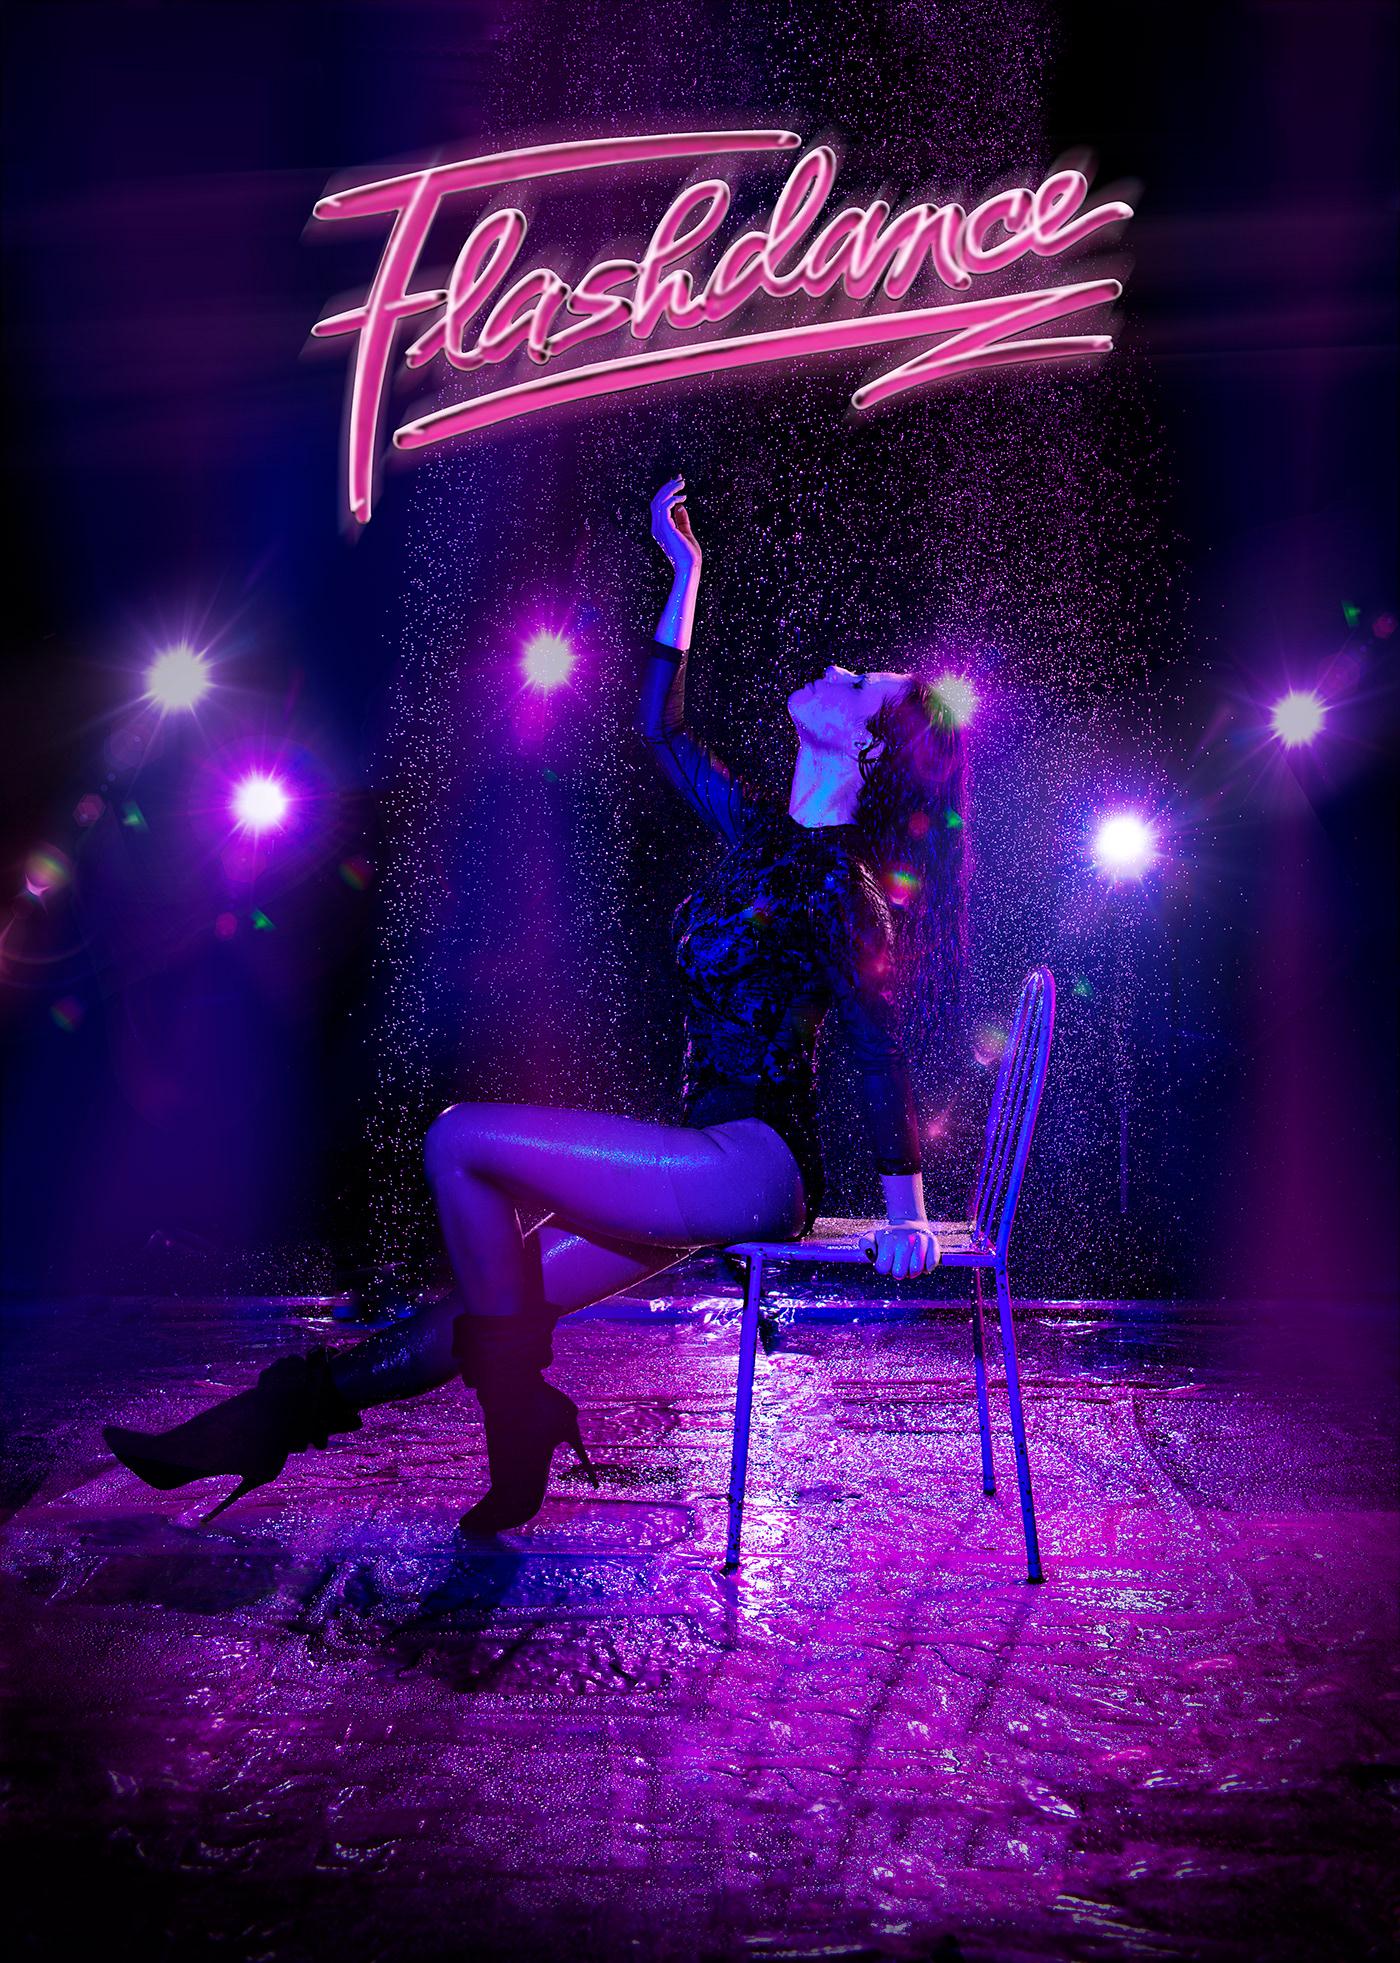 flashdance movie 80's Irene Cara student glow design Advertising  poster cine